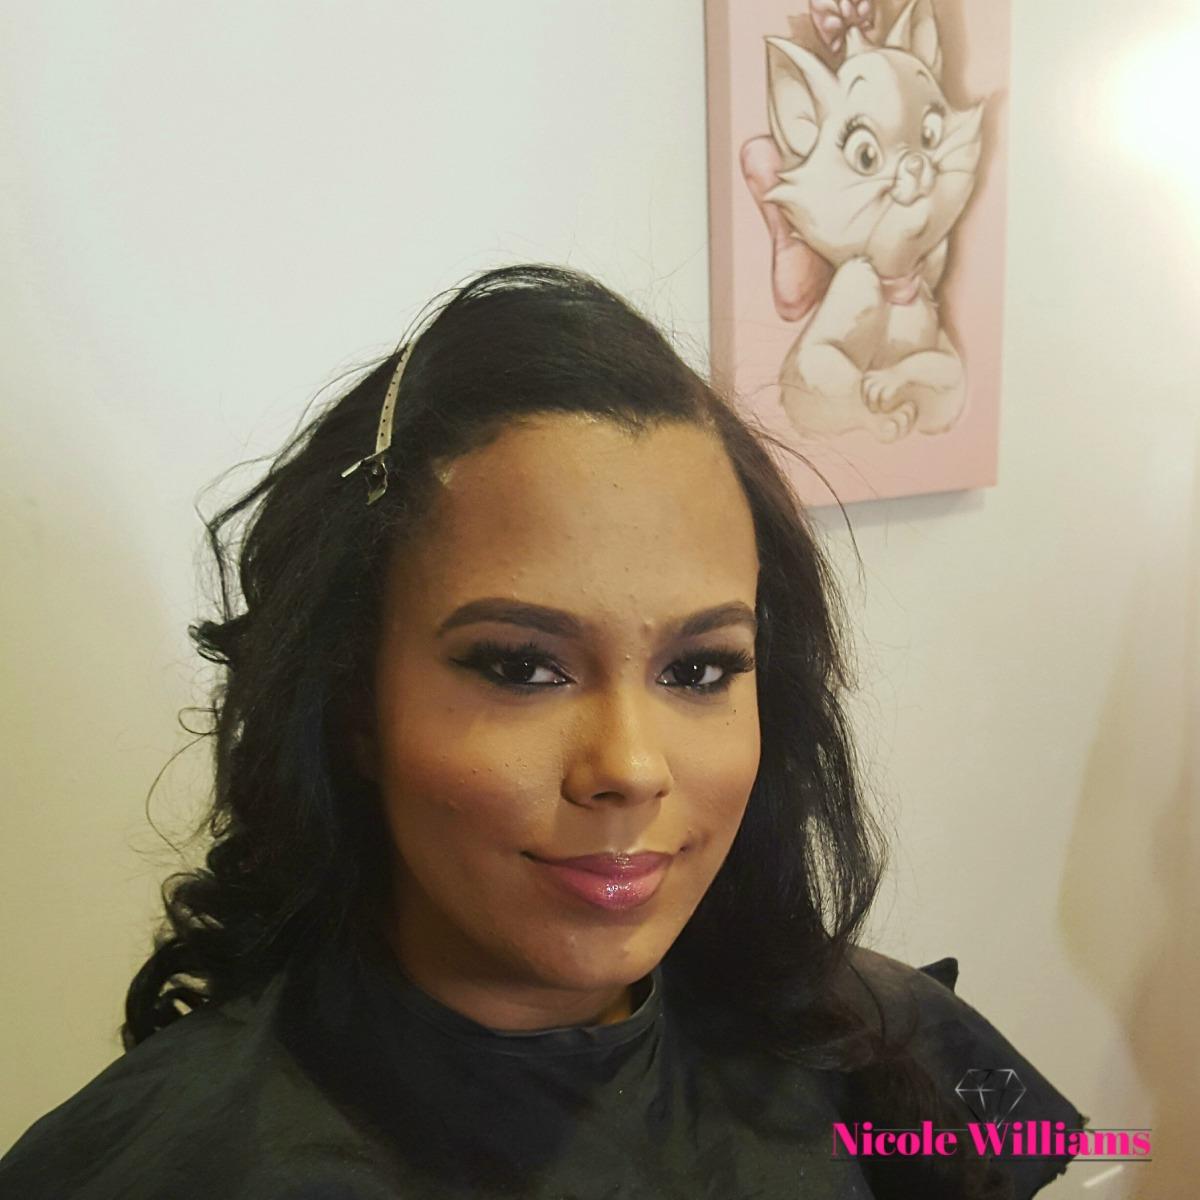 mya-ling-sweet-16-makeup-2.jpg